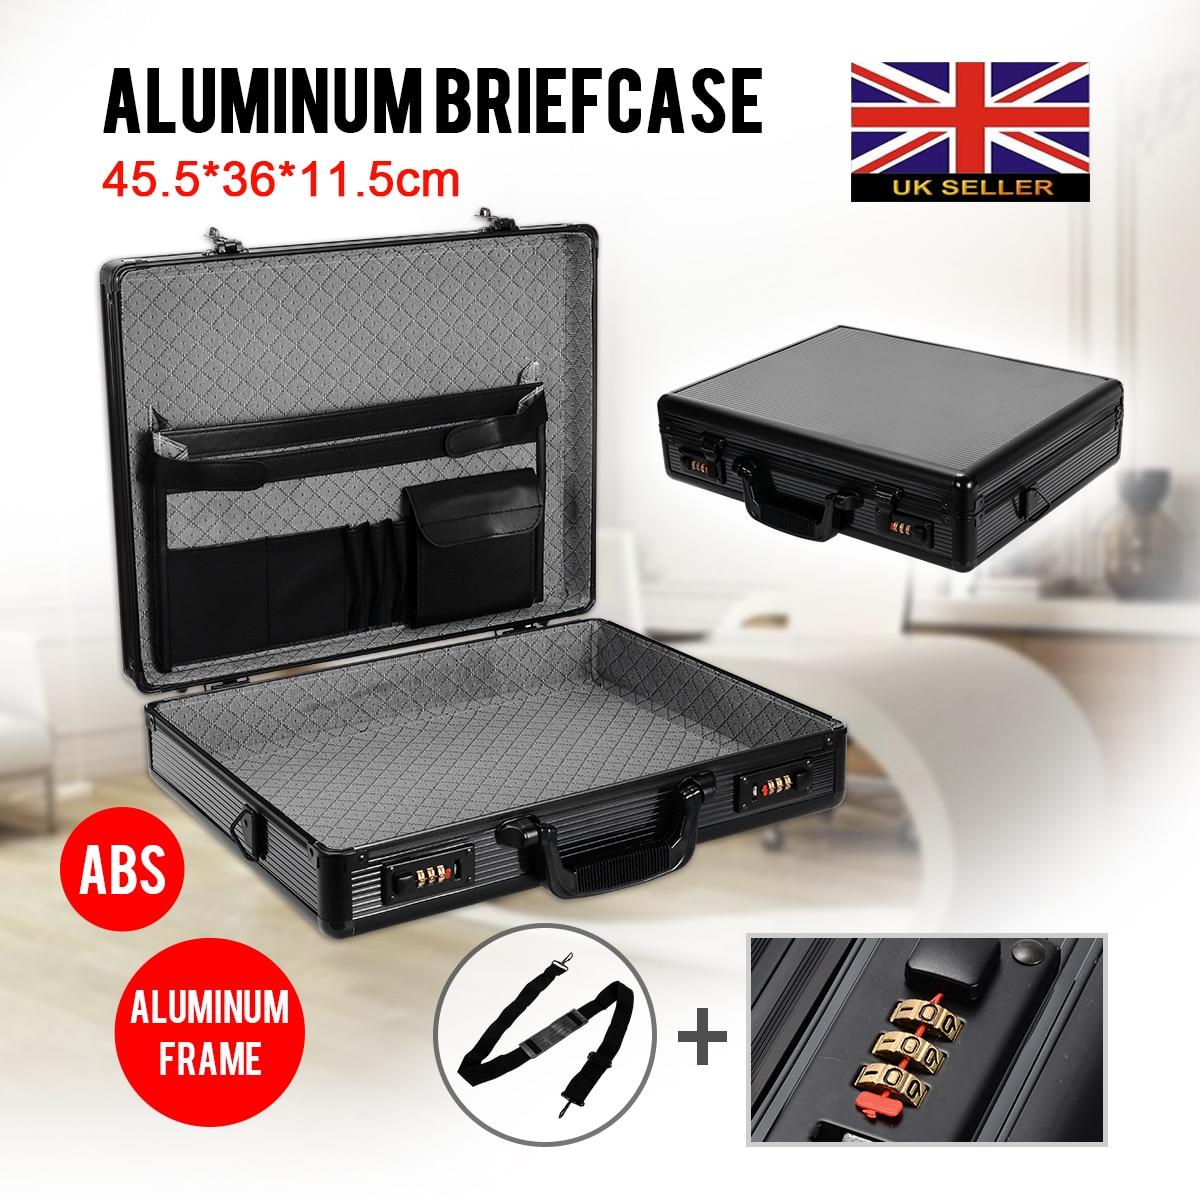 Mayitr 1pc Black Aluminium Briefcase Executive Laptop Brief Flight Case Storage Box Bag 455*360*115mm For Document Equipment